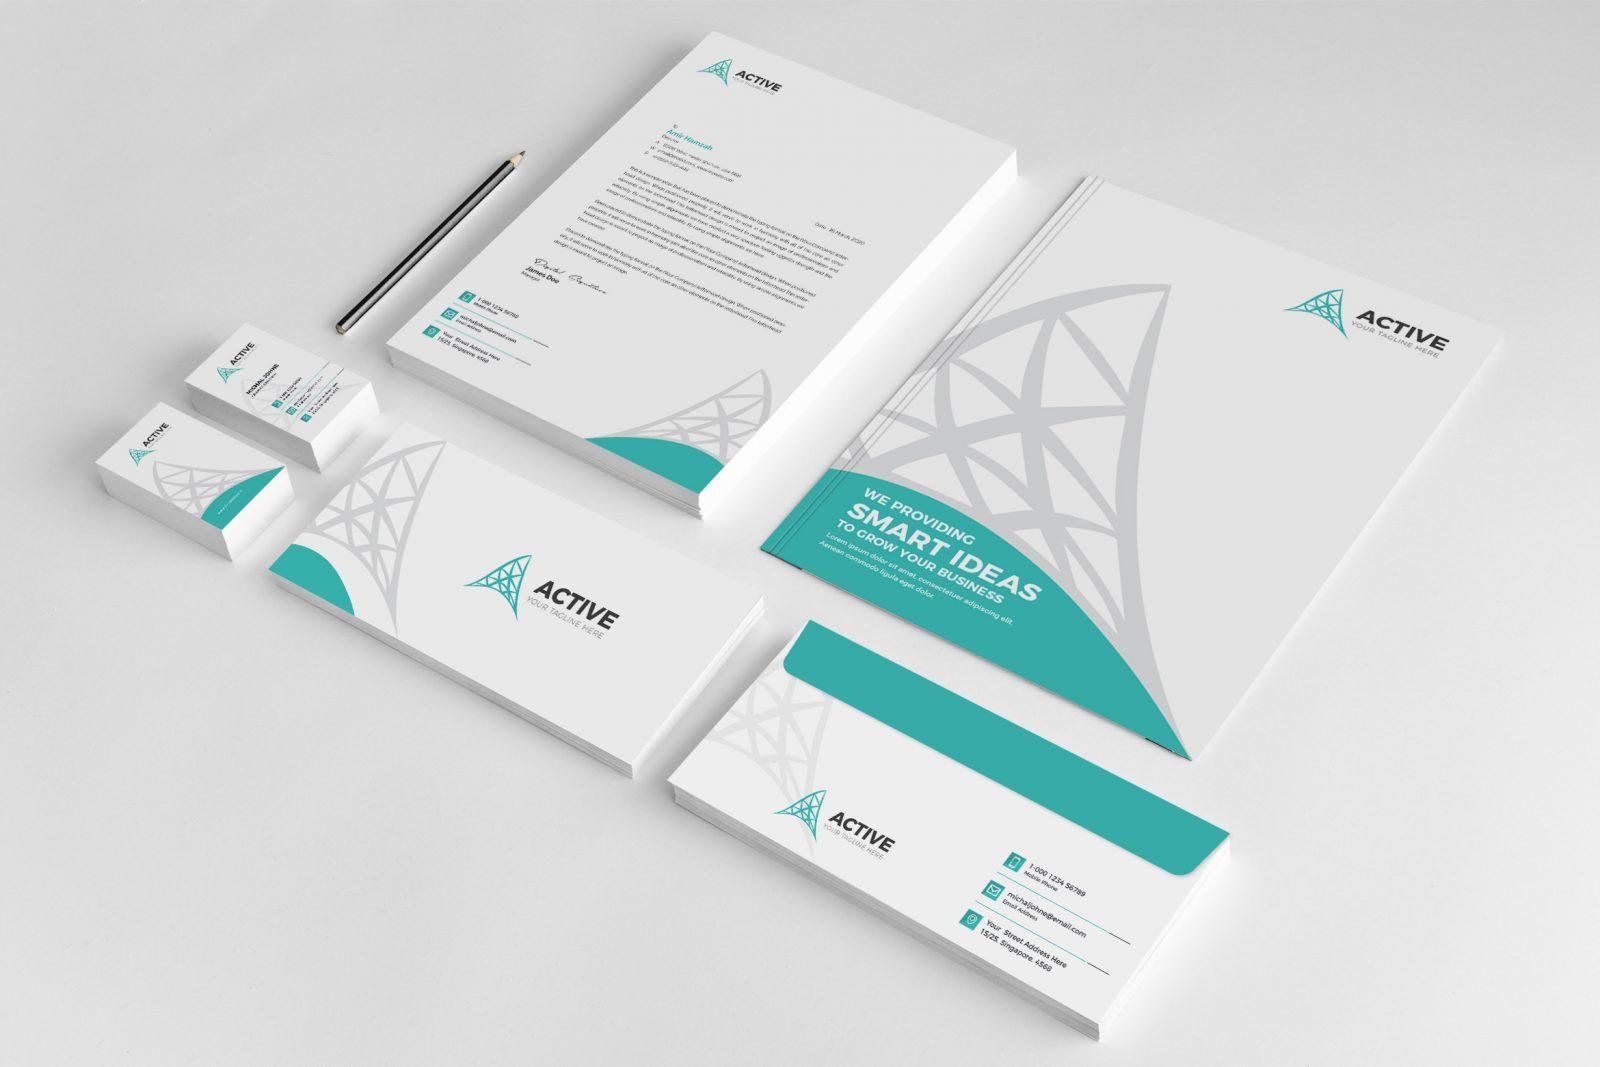 active creative corporate identity design template 001952